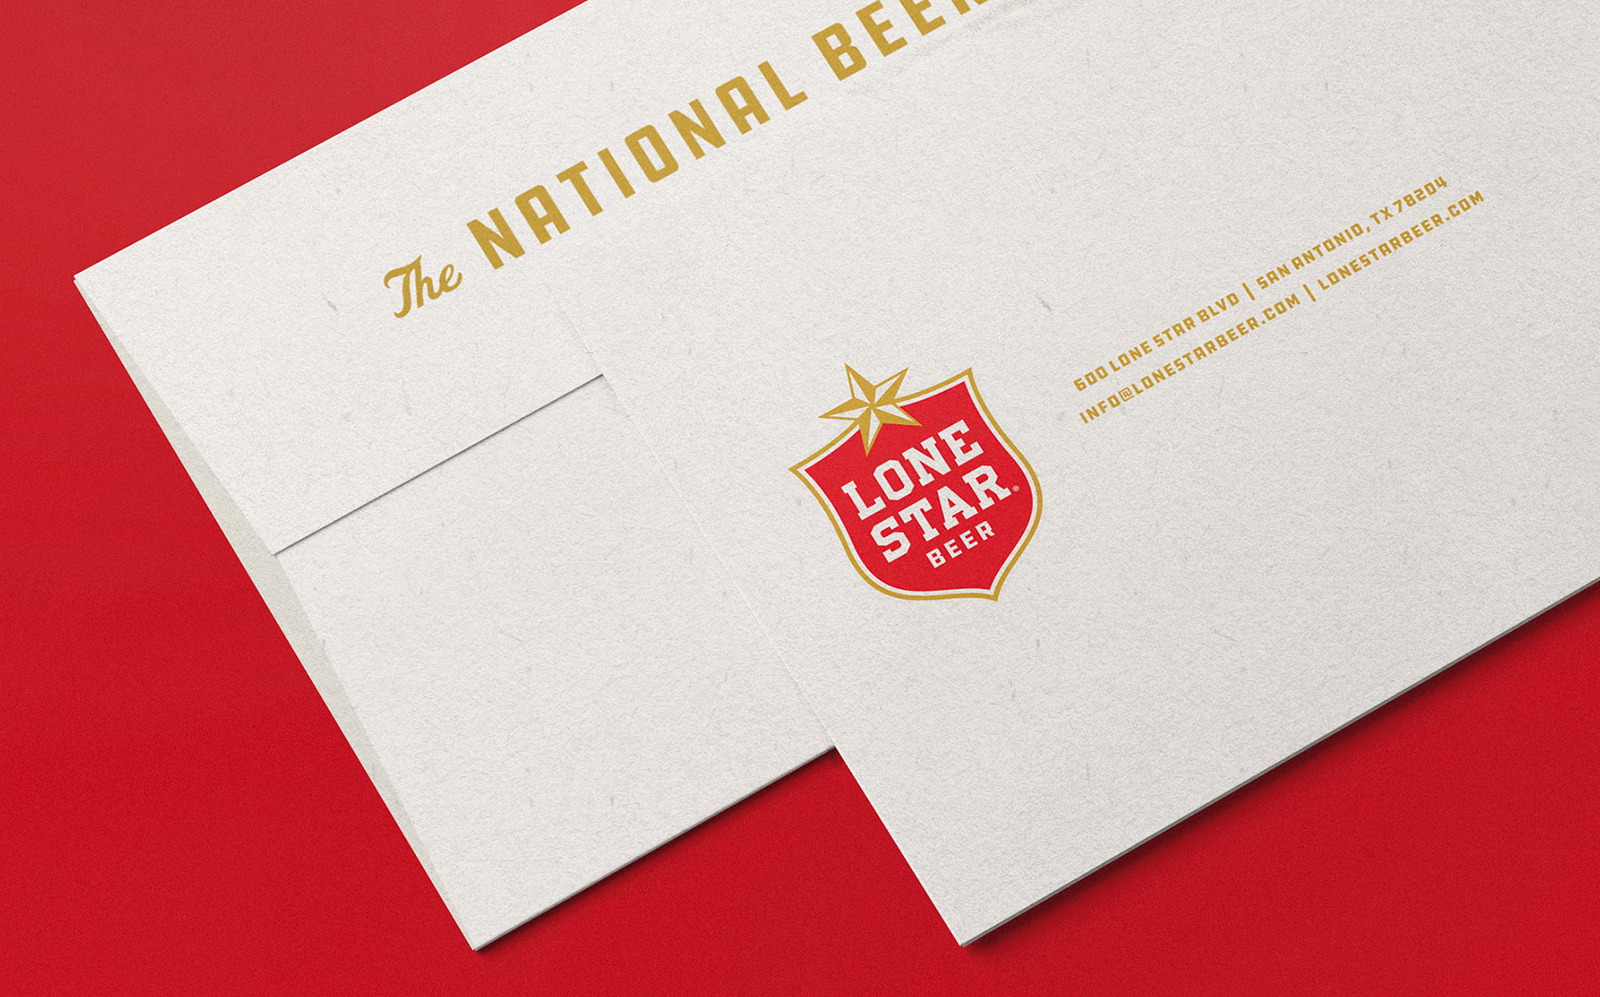 Lone Star孤星啤酒品牌更新全新的品牌VI视觉和包装设计-深圳VI设计8